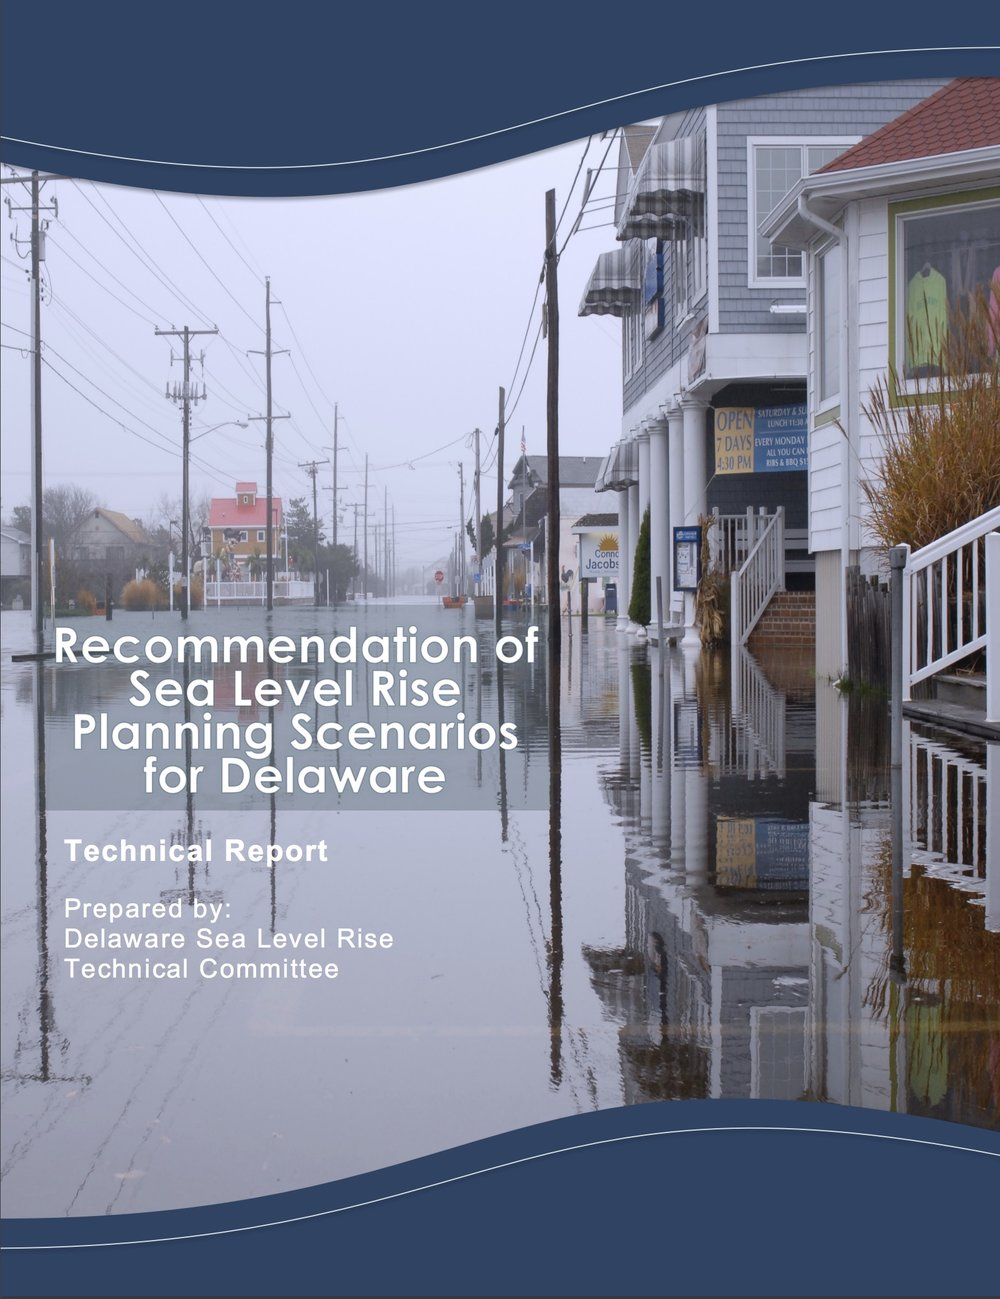 Recommendation of Sea Level Rise Planning Scenarios for Delaware